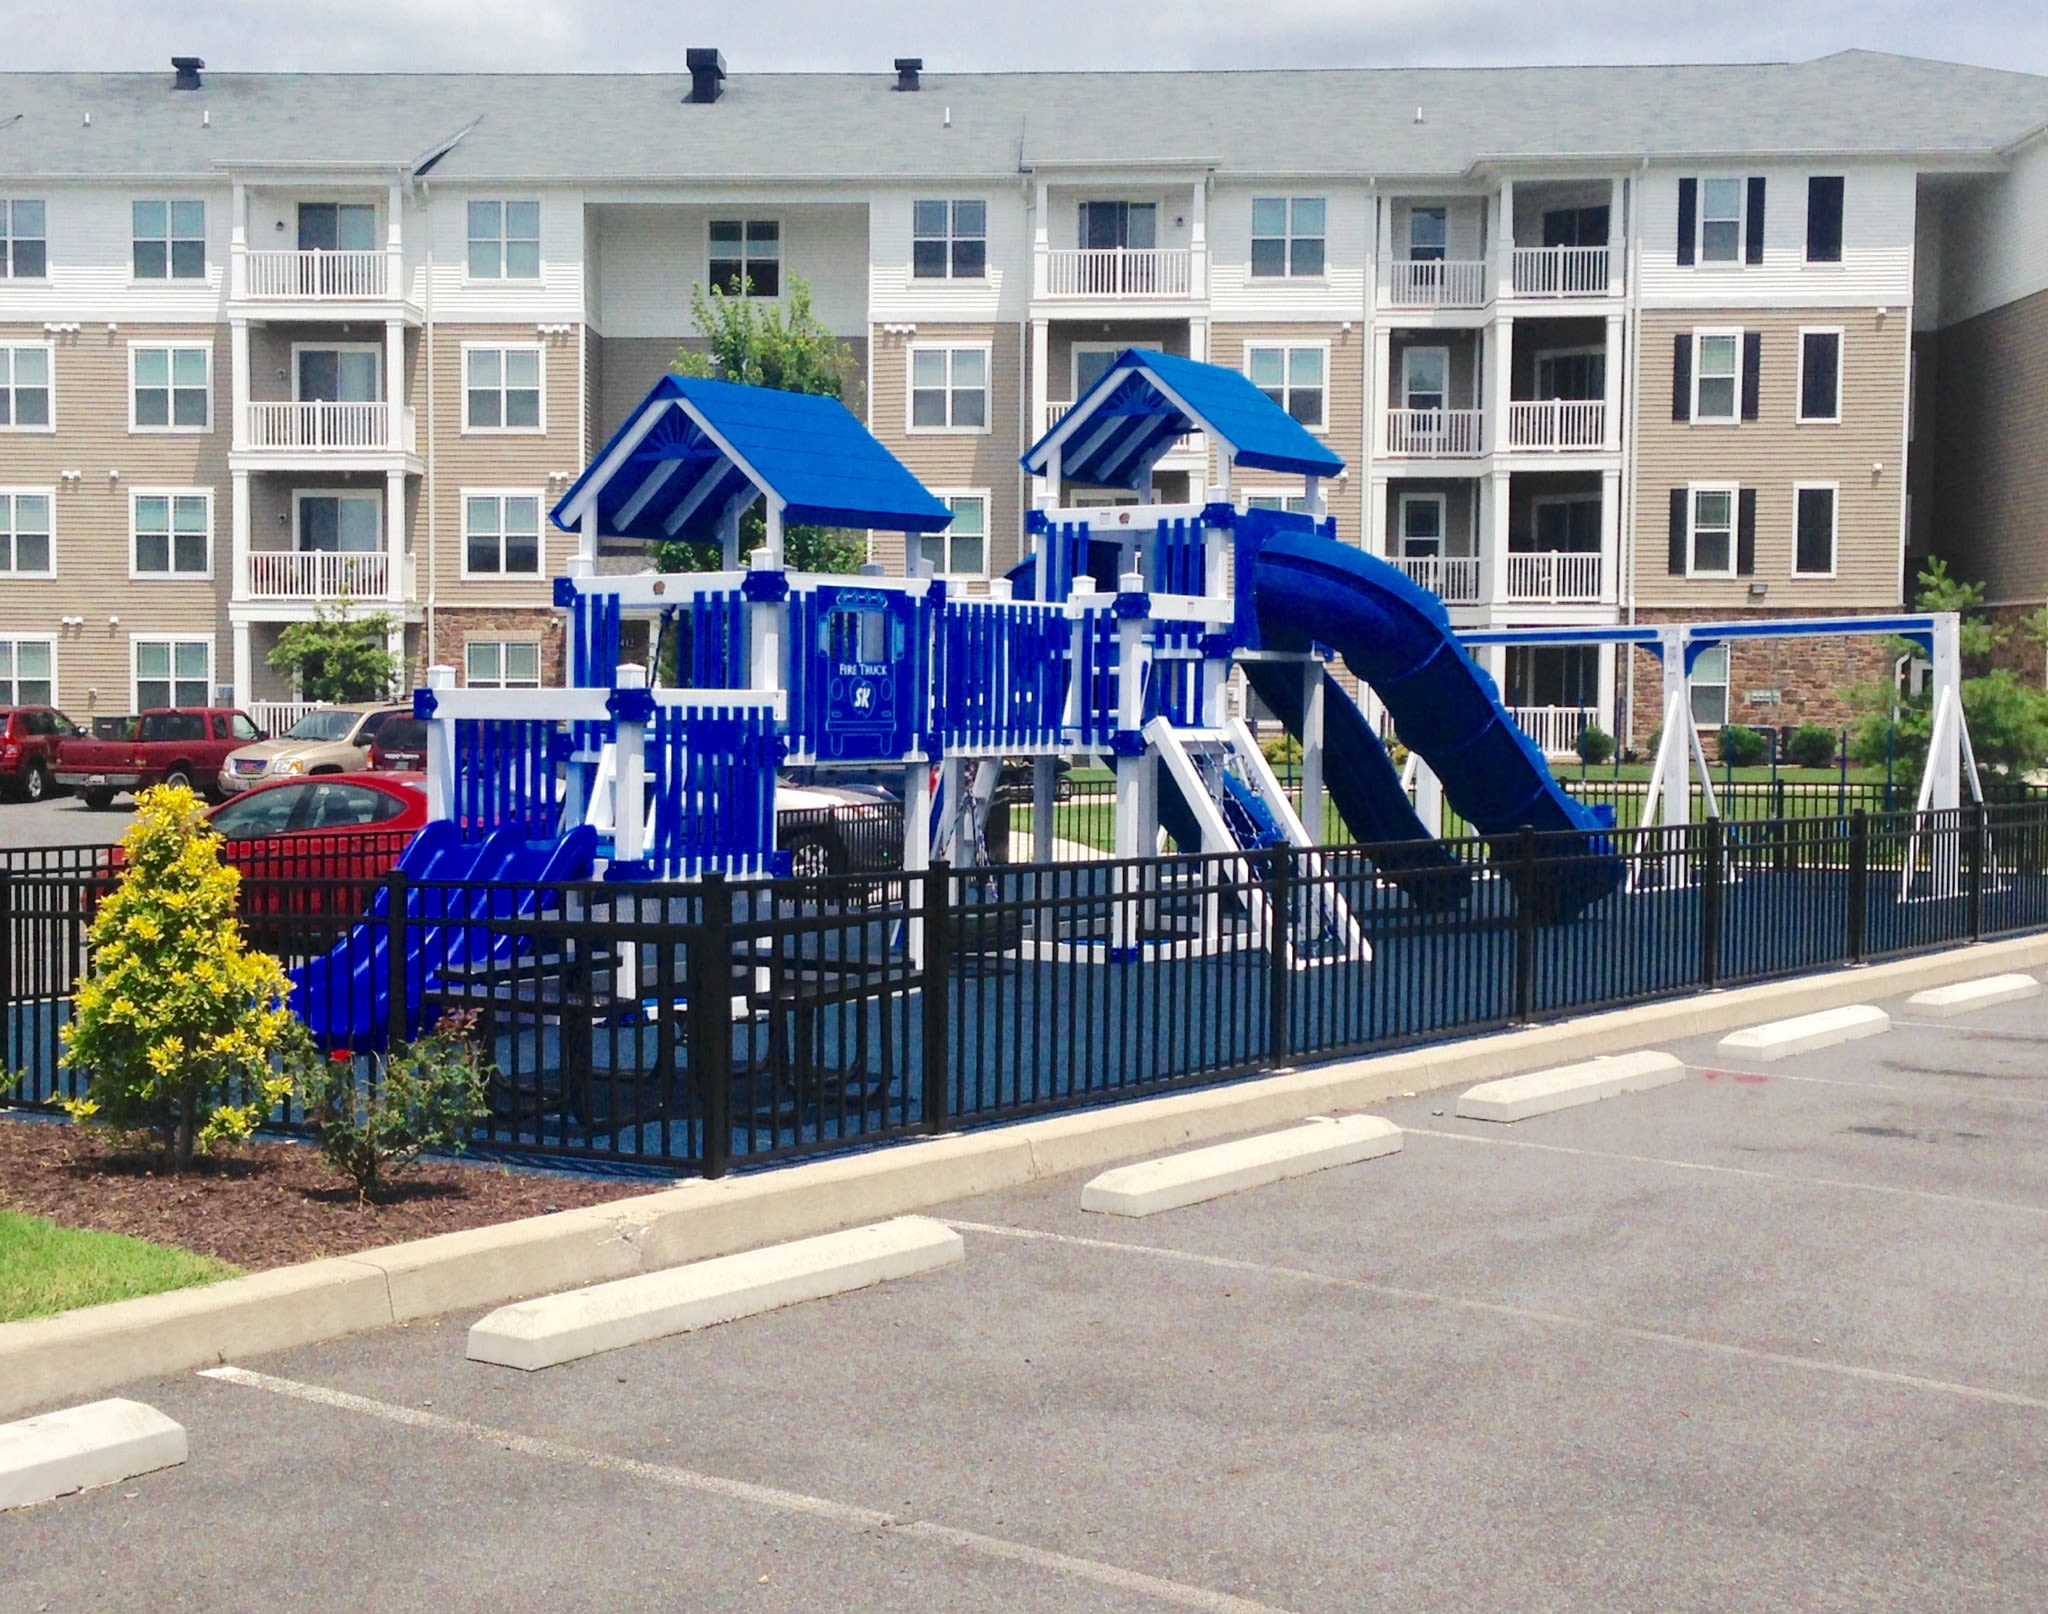 Playground at Addison Court in Salisbury